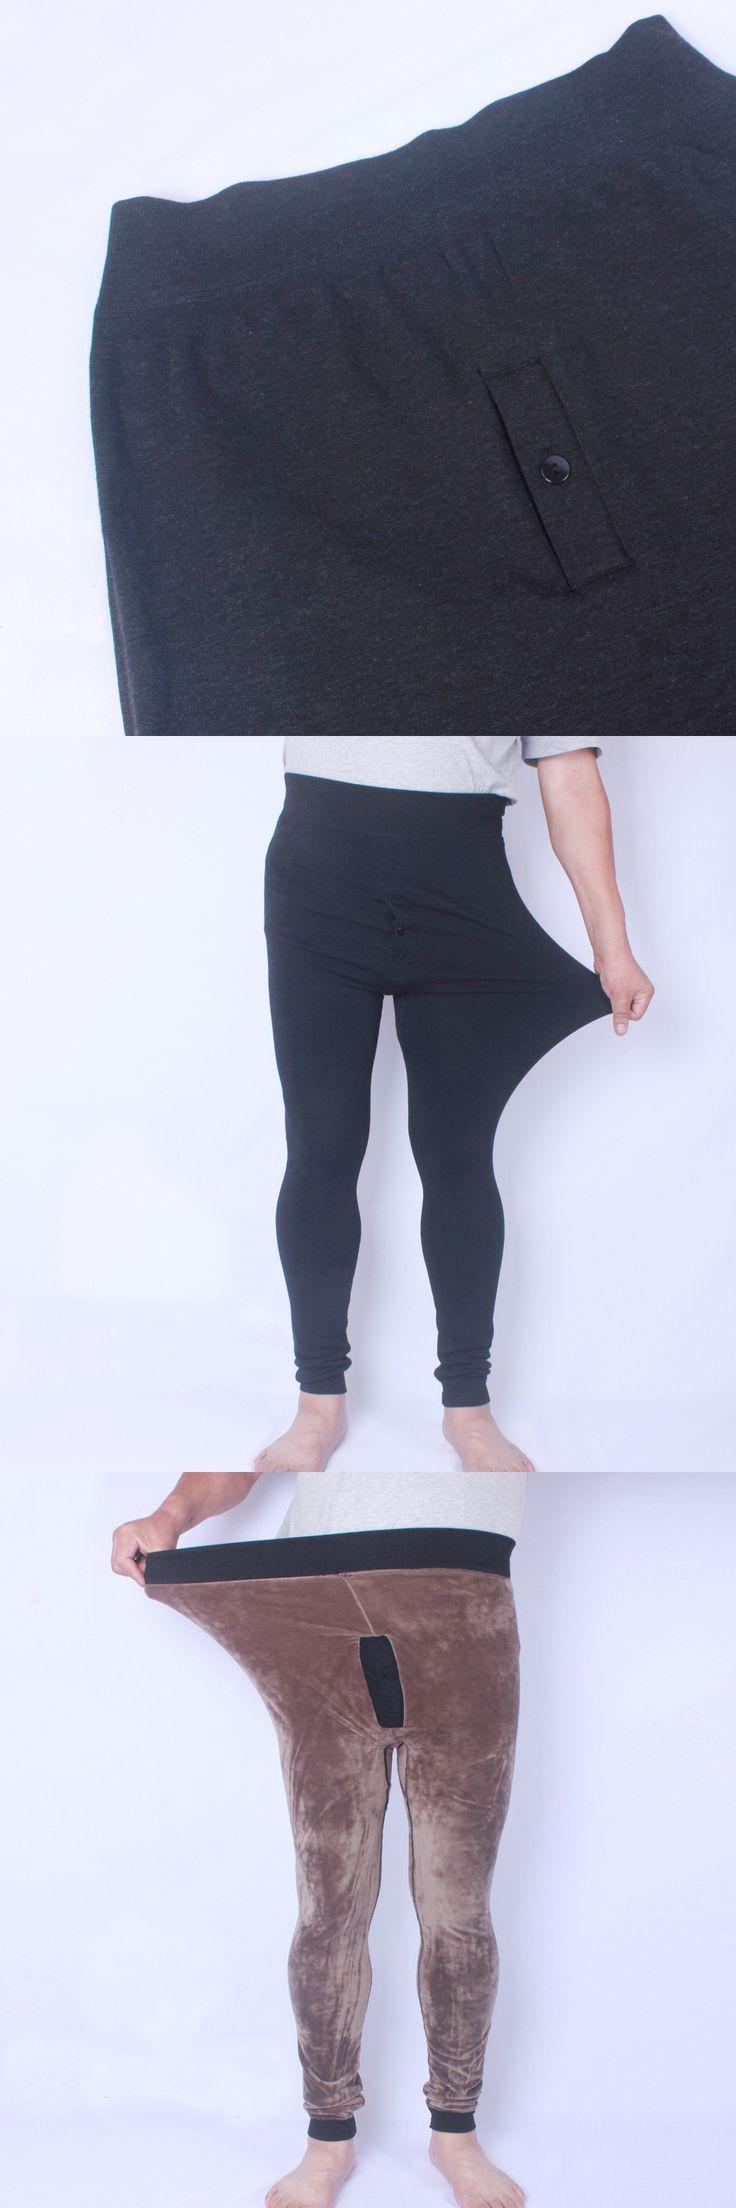 Men's Winter Super Thick Legging Pants Large One Size XXXXL Warm Soft Cotton Underwear Seamless Elastic Male Pants Fit Russia